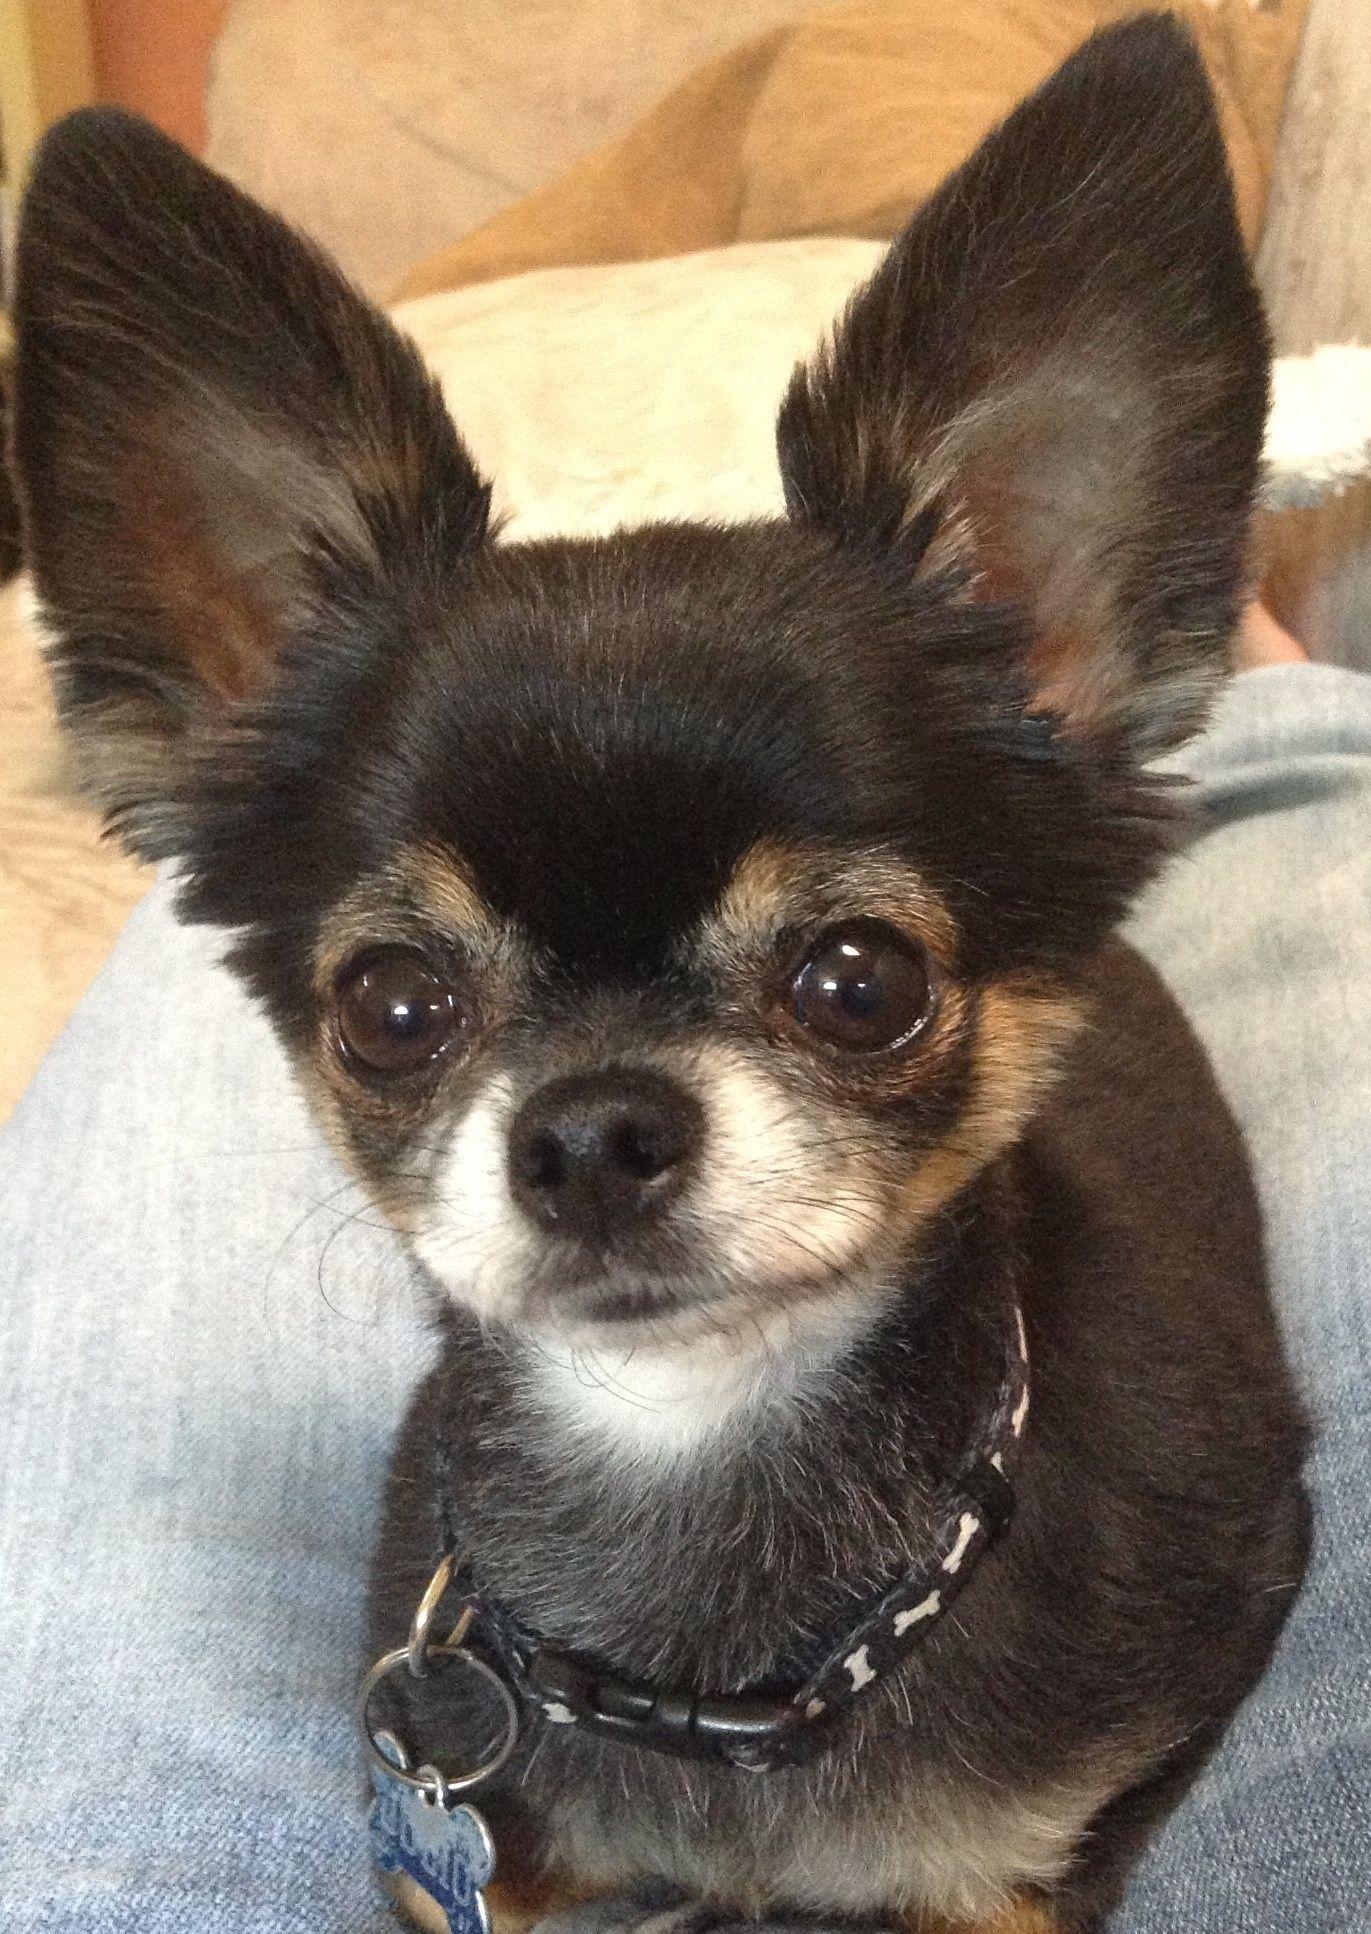 Chihuahua Beauty What Big Ears You Have Chihuahua Love Chihuahua